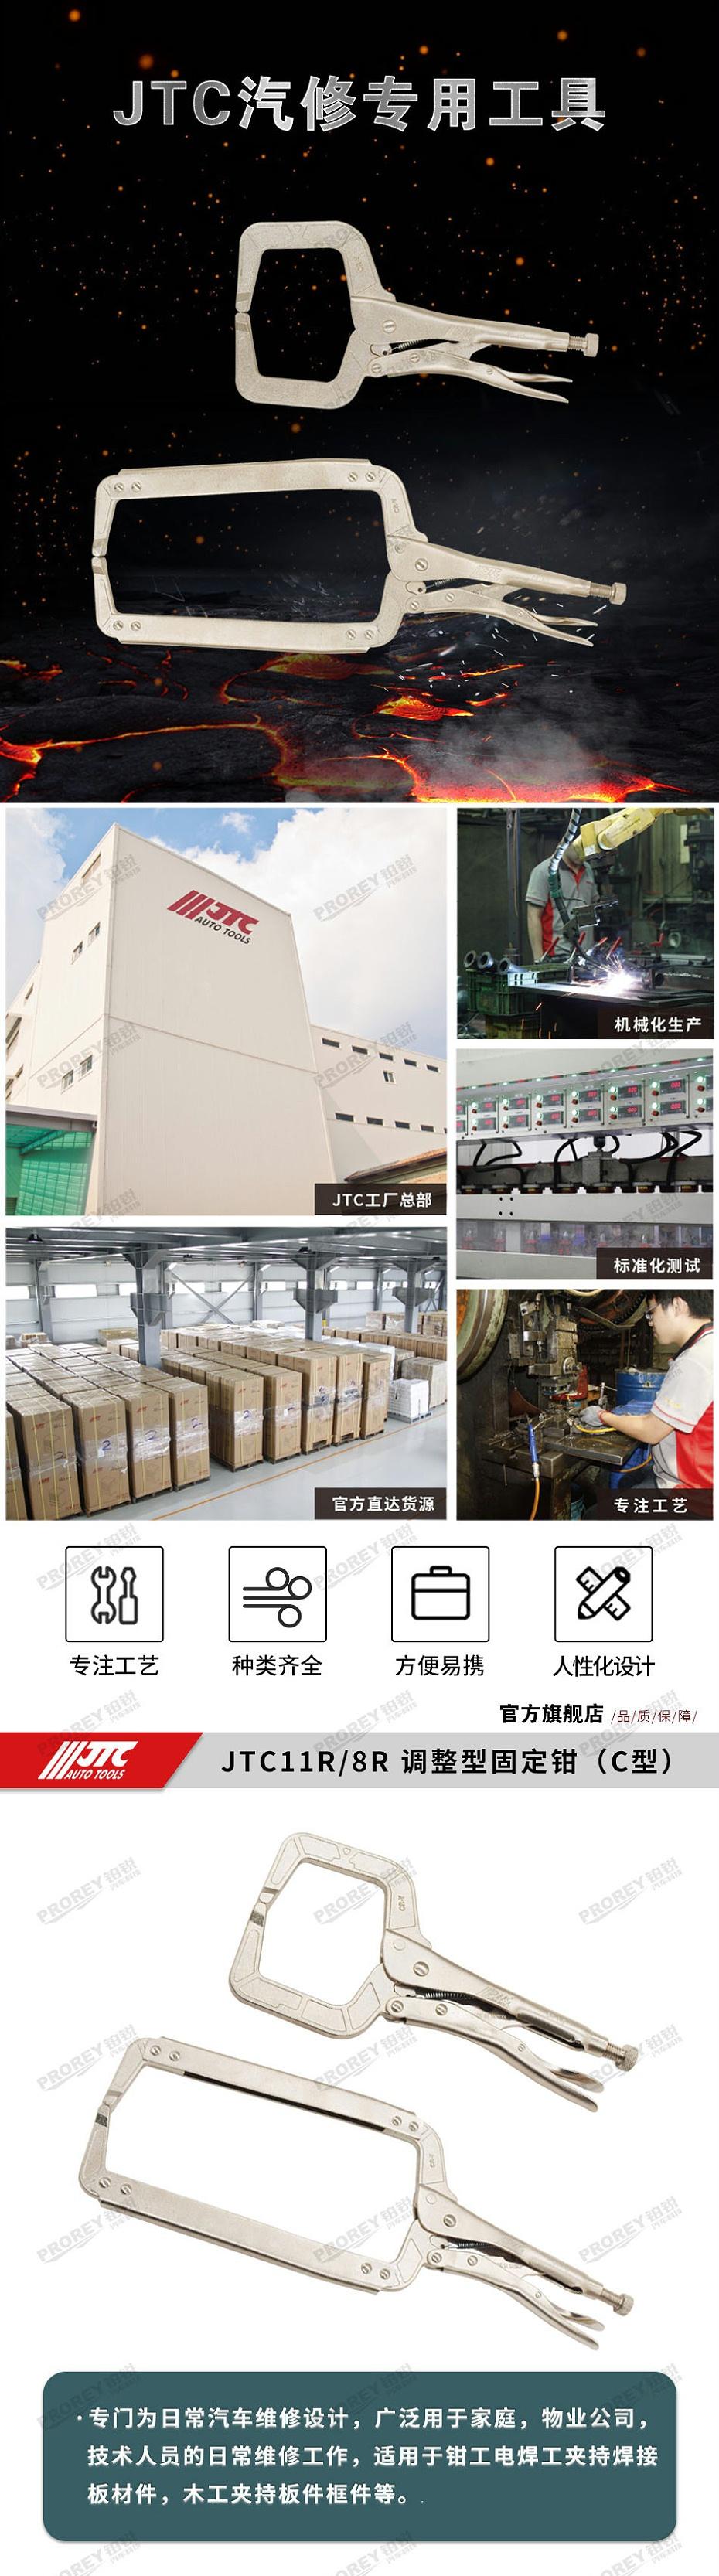 GW-130040147-JTC-11R-调整型固定钳(C型)-1